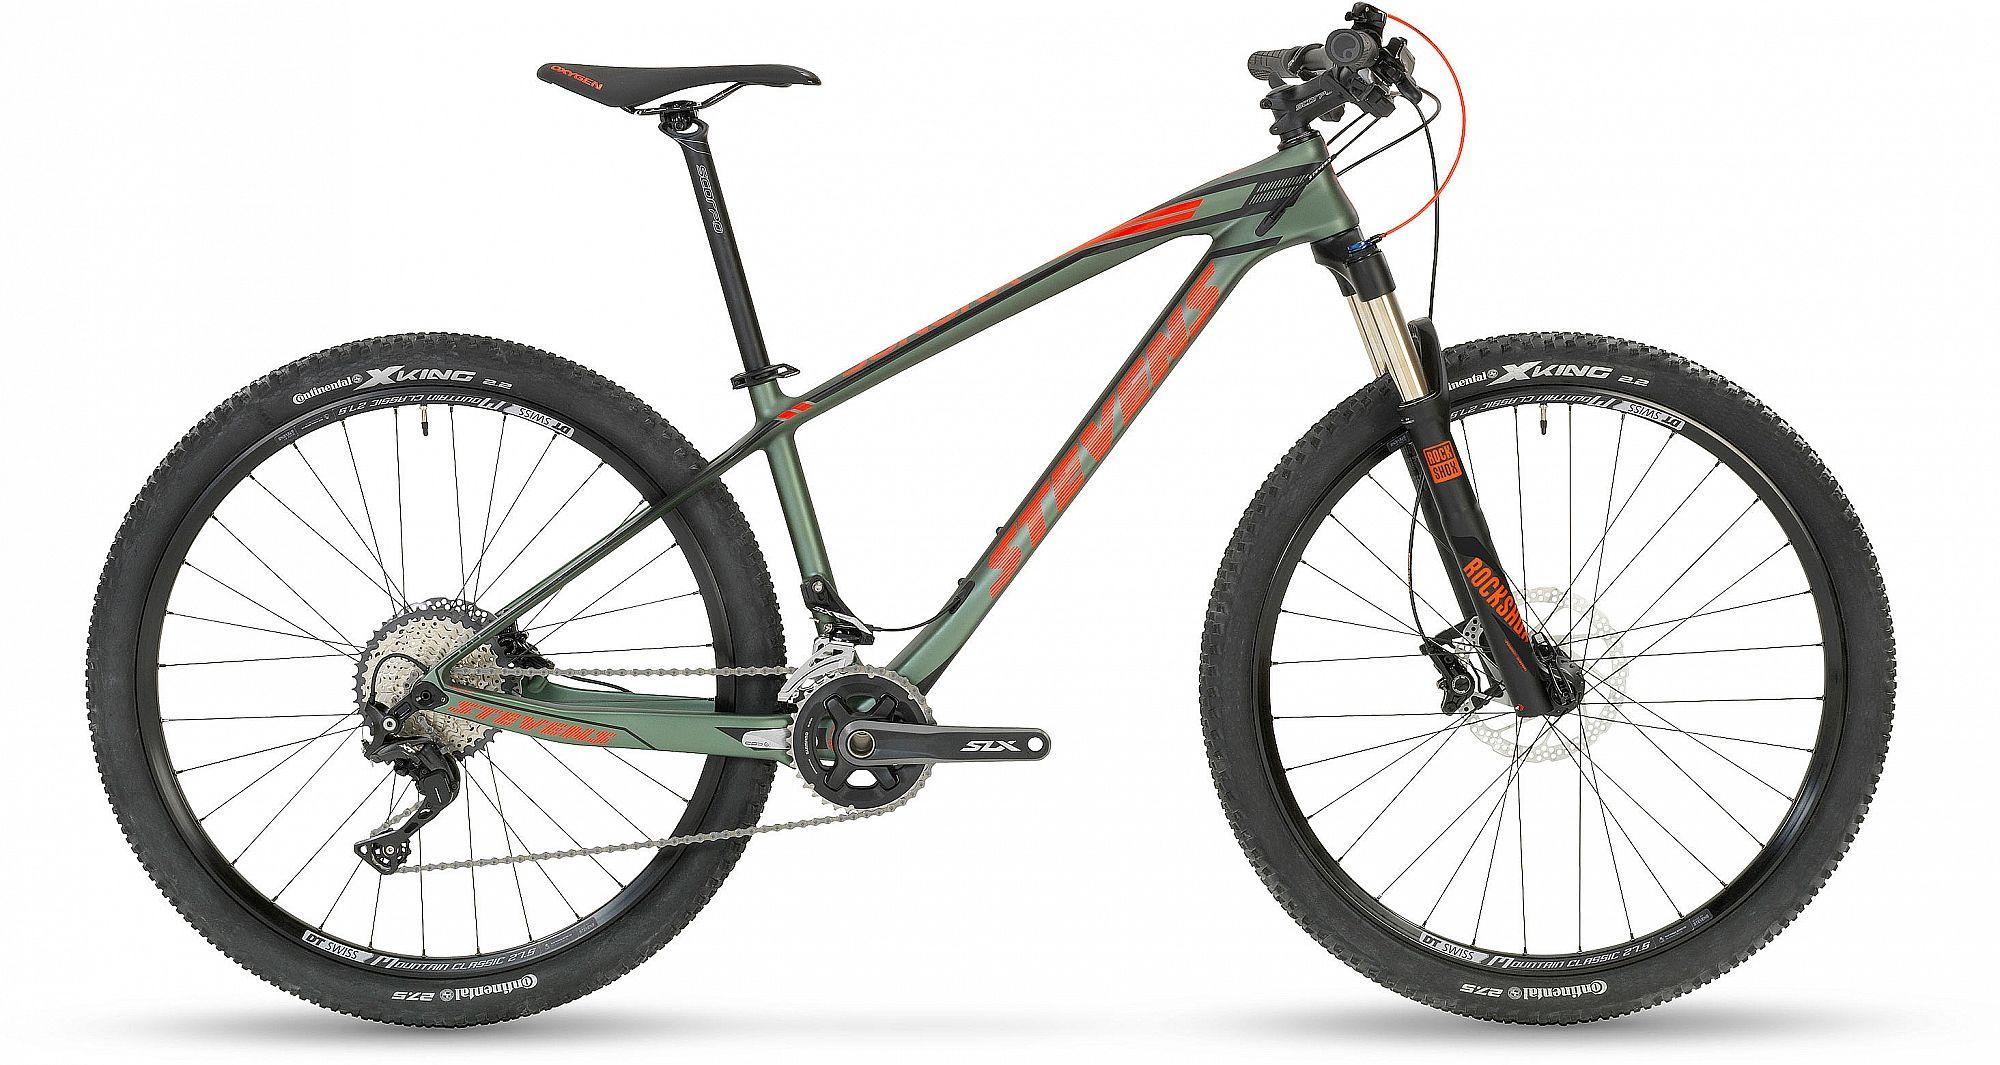 stevens 2017 sonora 29 zelen xc carbon stevens bikes. Black Bedroom Furniture Sets. Home Design Ideas